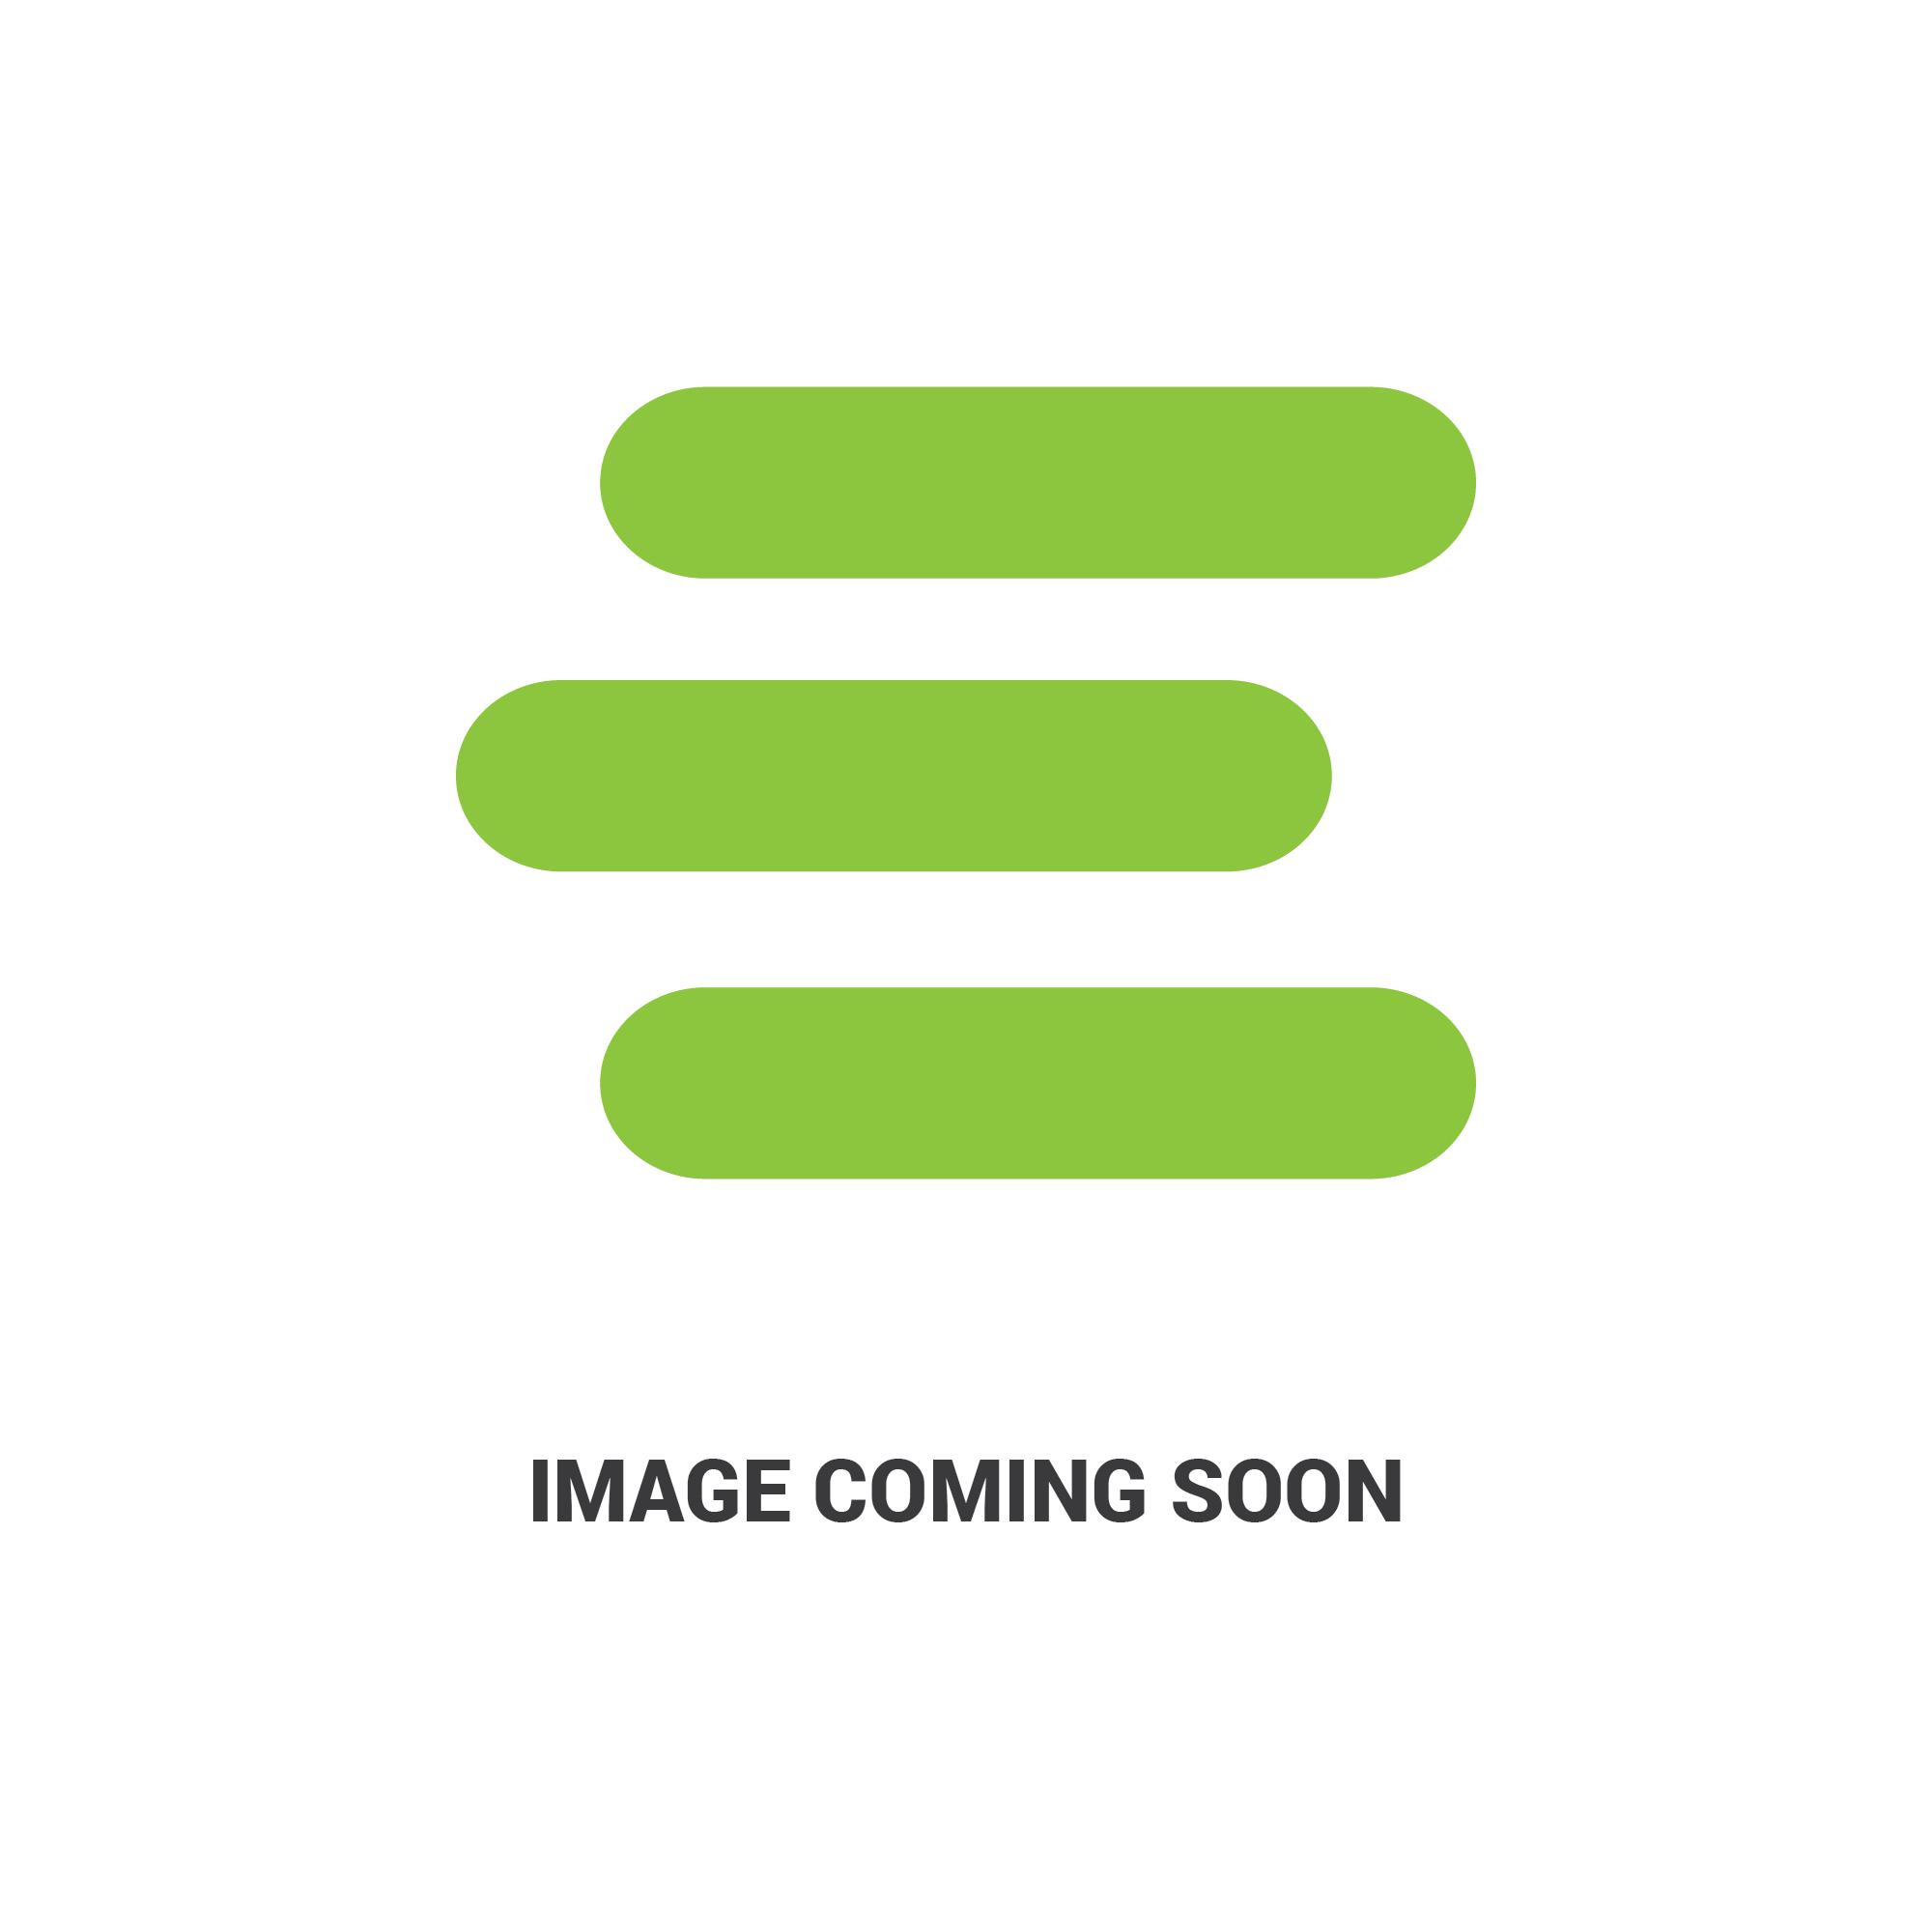 E-15531-65950edit 1.jpg